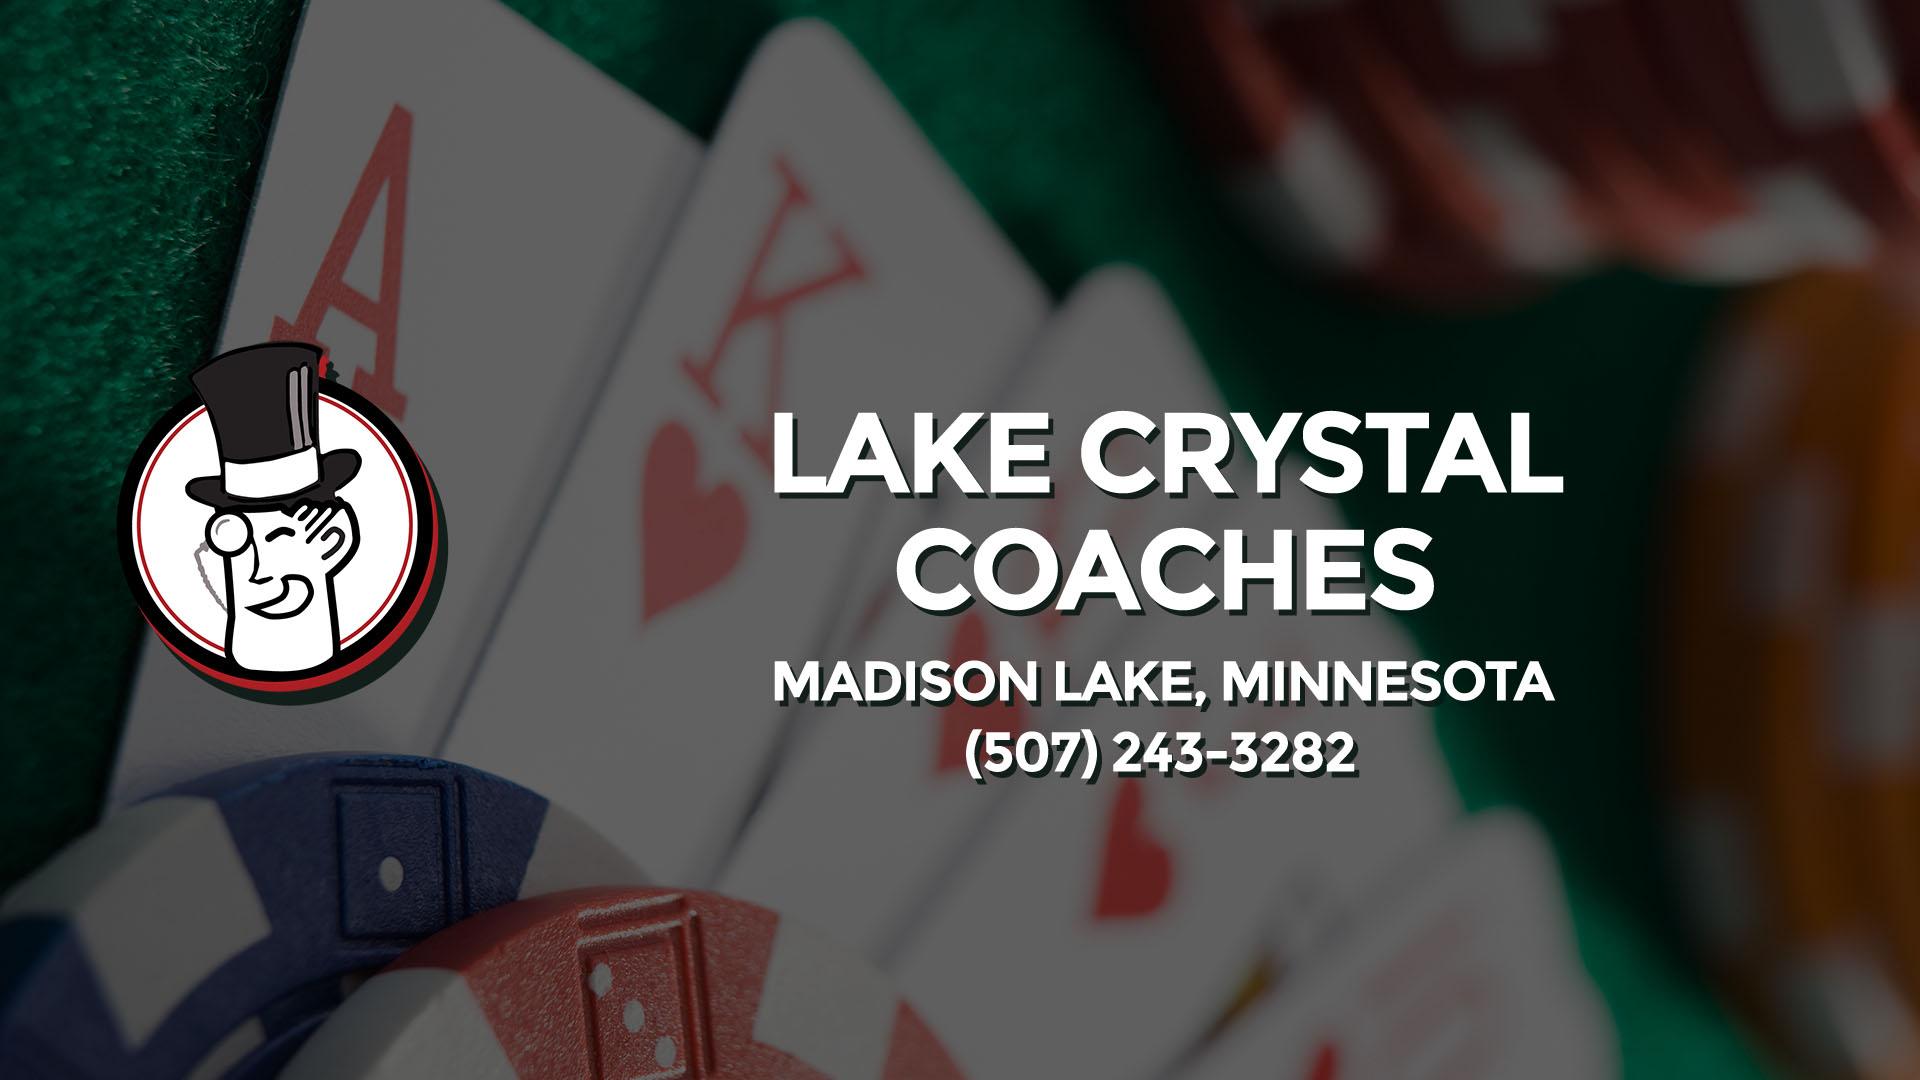 Lake crystal coaches casino gold diggers casino